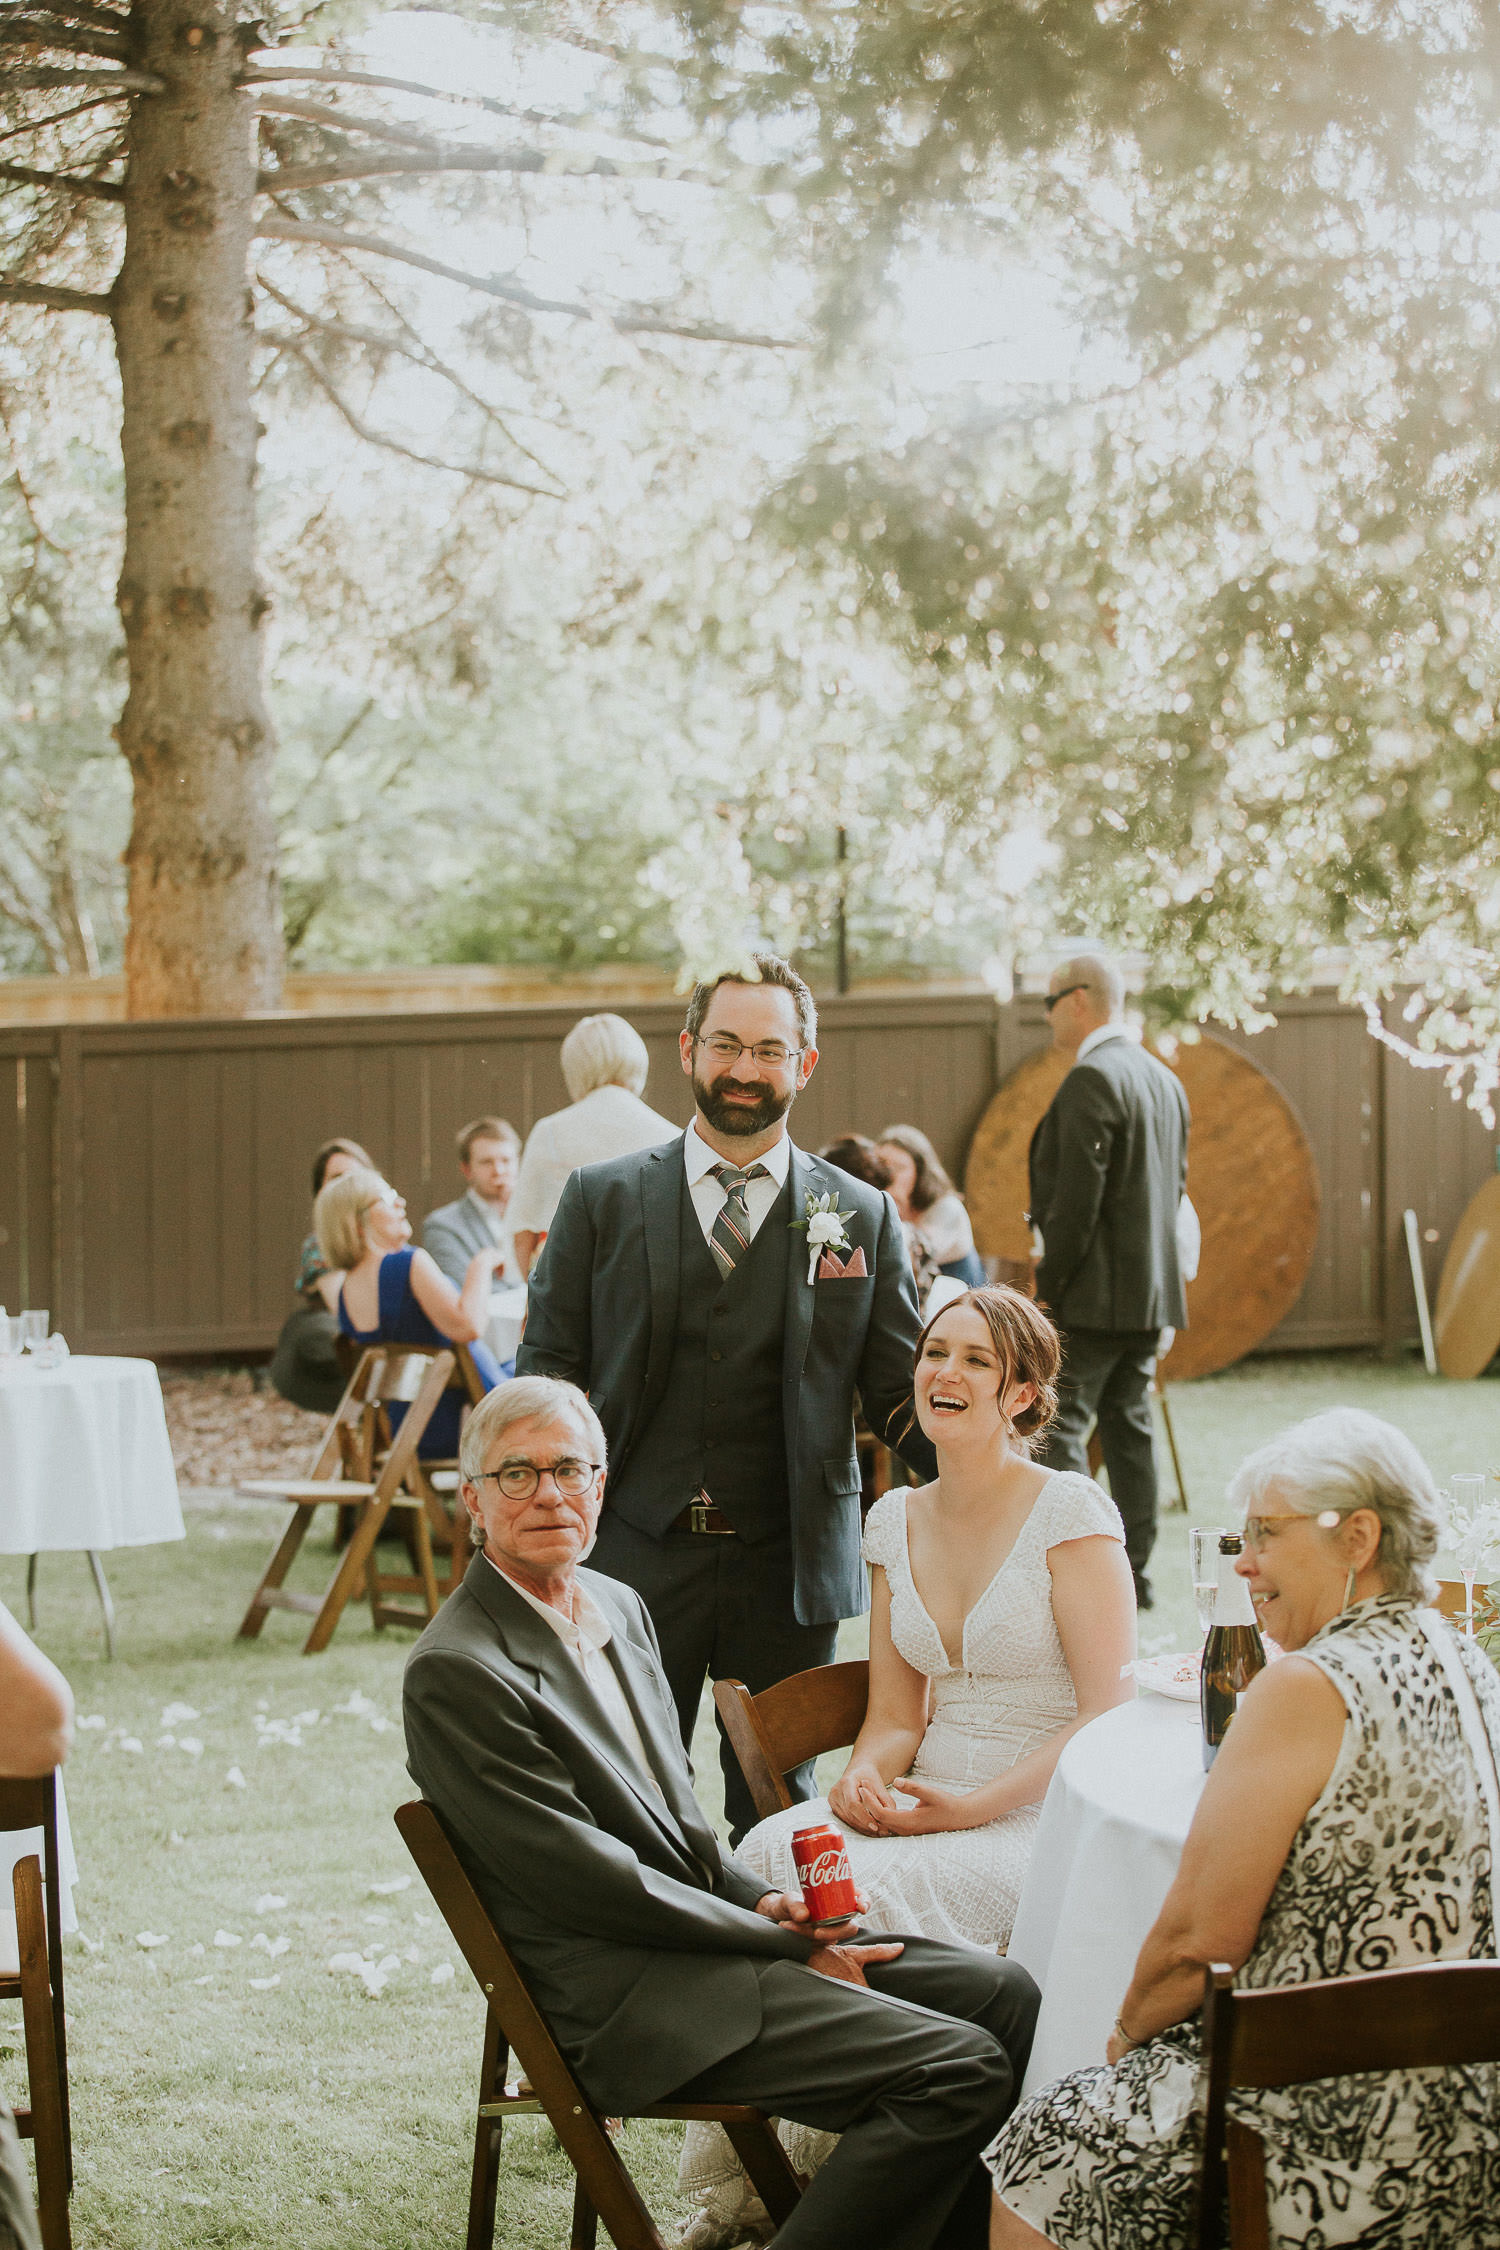 summer-backyard-wedding-in-alberta-sarah-pukin-0192